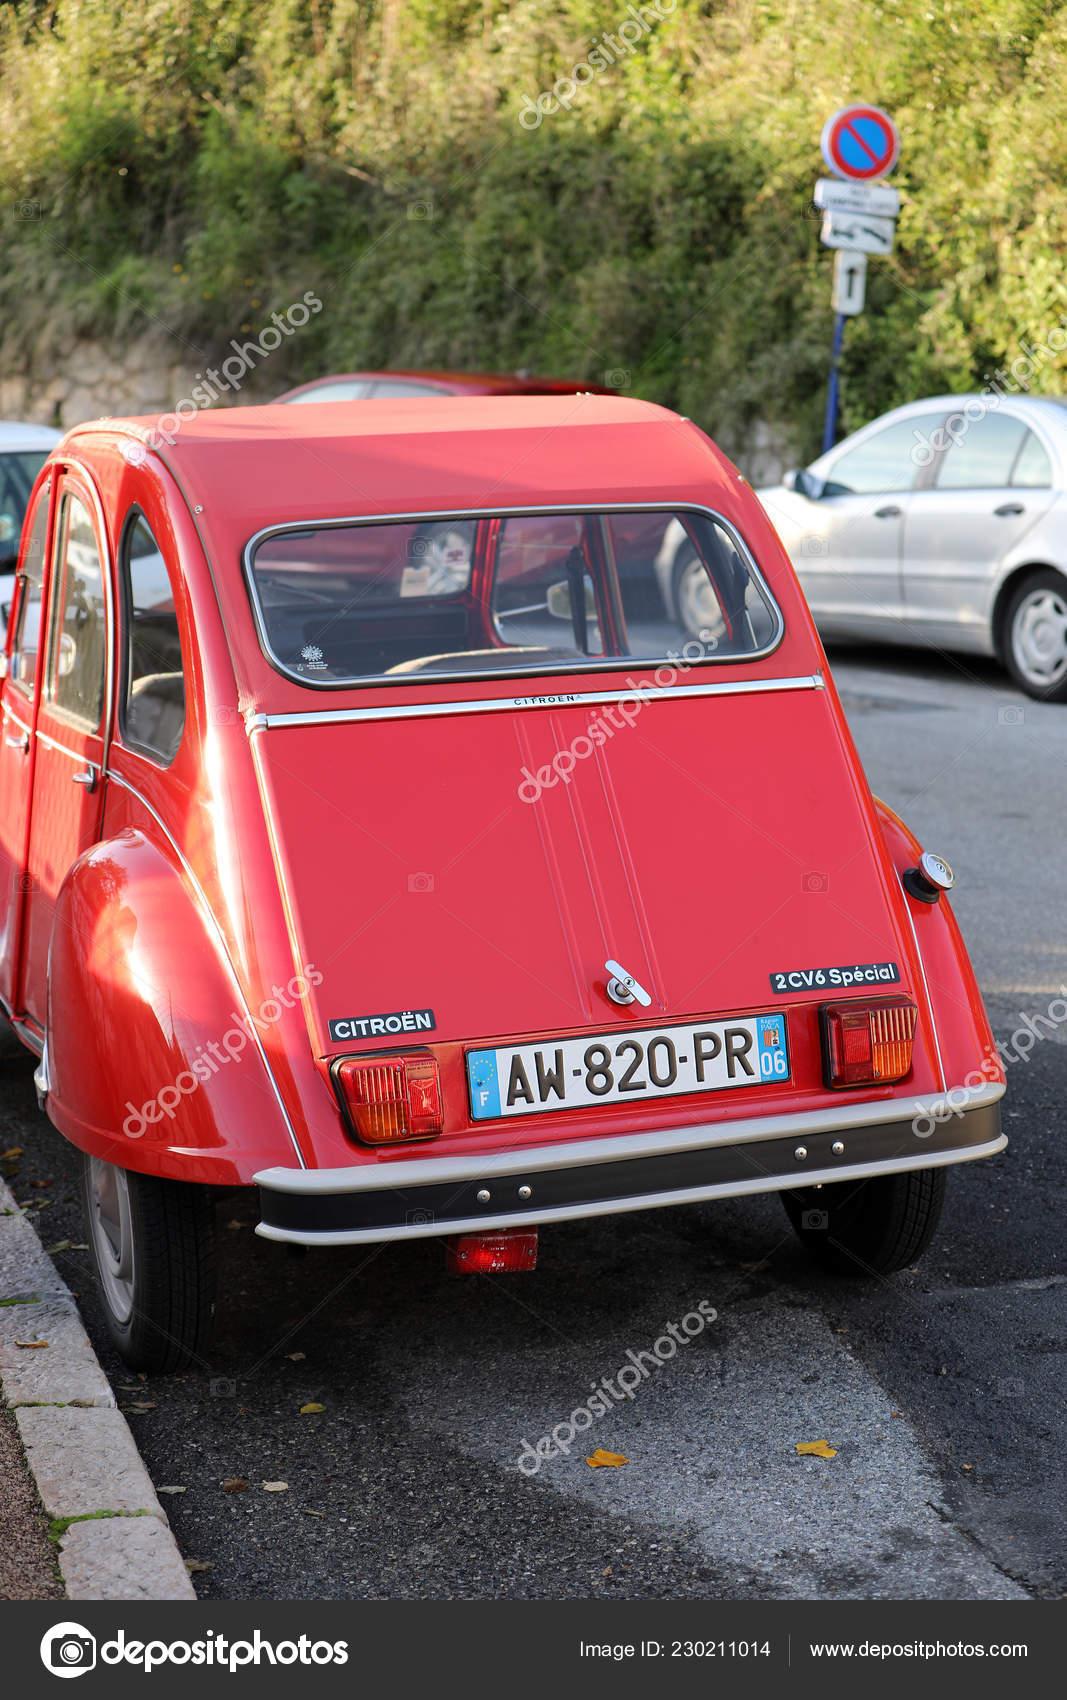 f16995eb8 Roquebrune-Cap-Martin, Francia-04 de diciembre de 2018: Rojo viejo coche  Citroen 2 Cv6 especial estacionado en la calle (vista posterior), Costa  Azul, ...